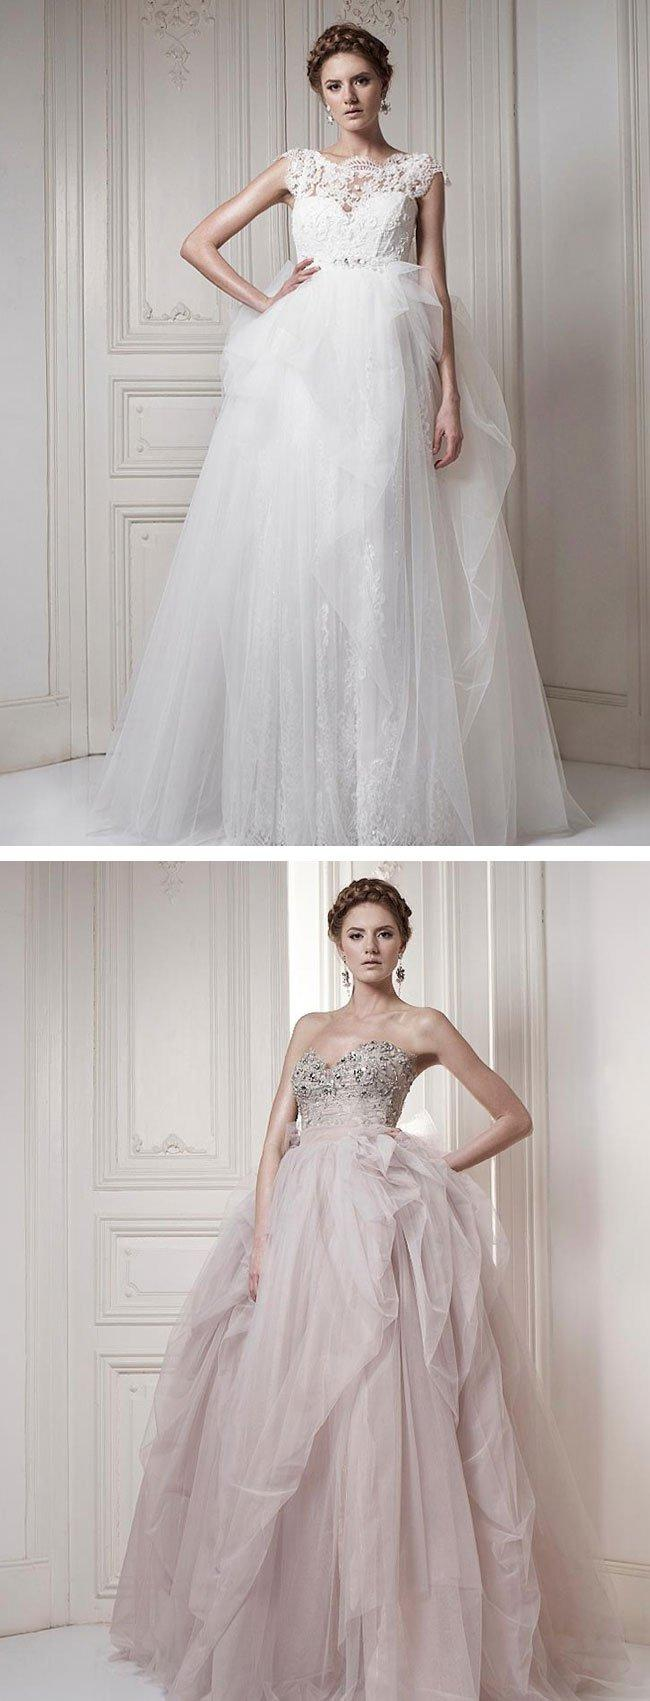 ersa atelier2013-4-wedding dresses